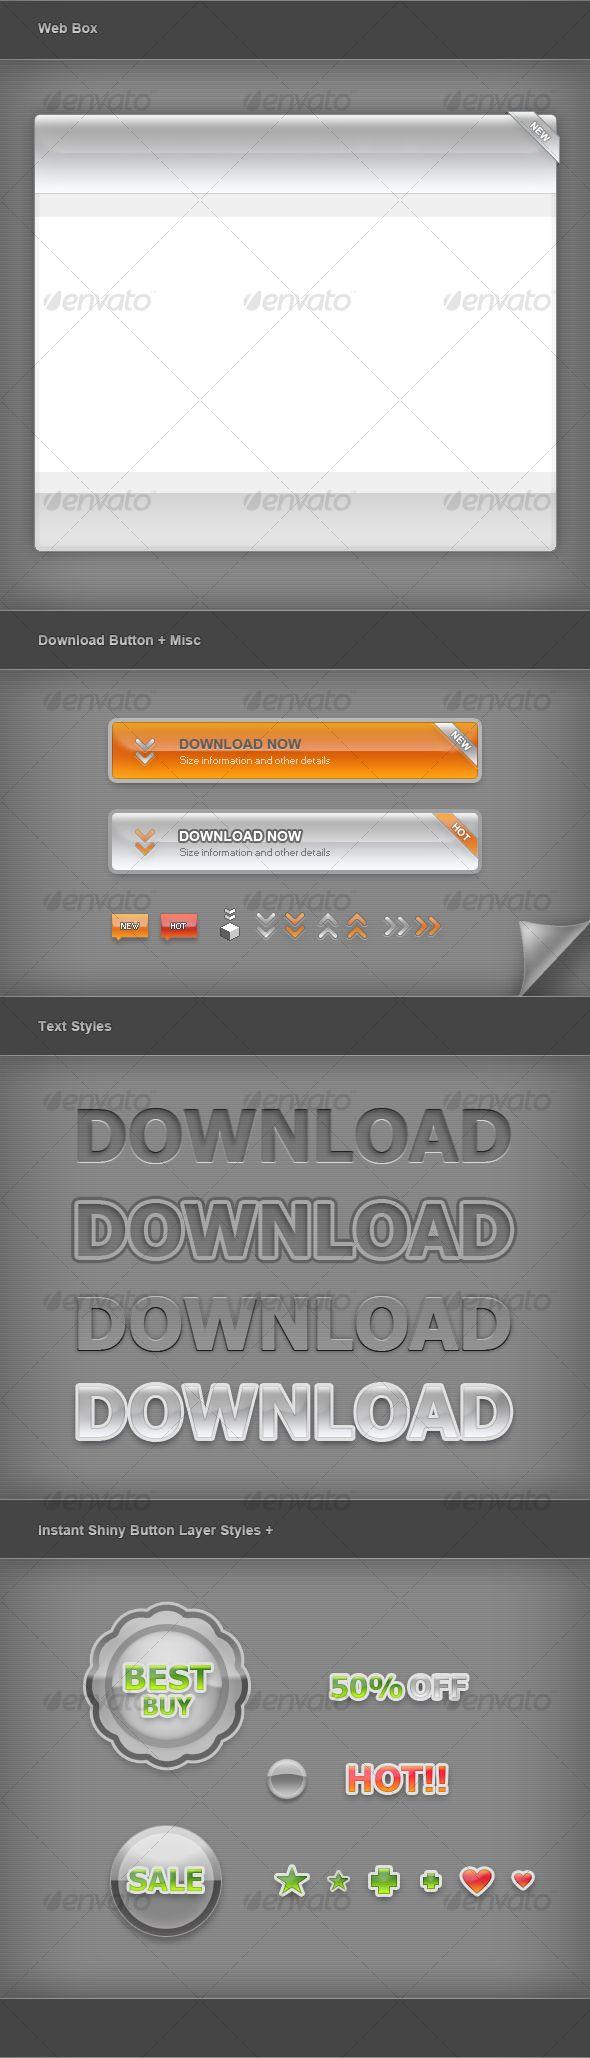 Web Graphic Elements 01